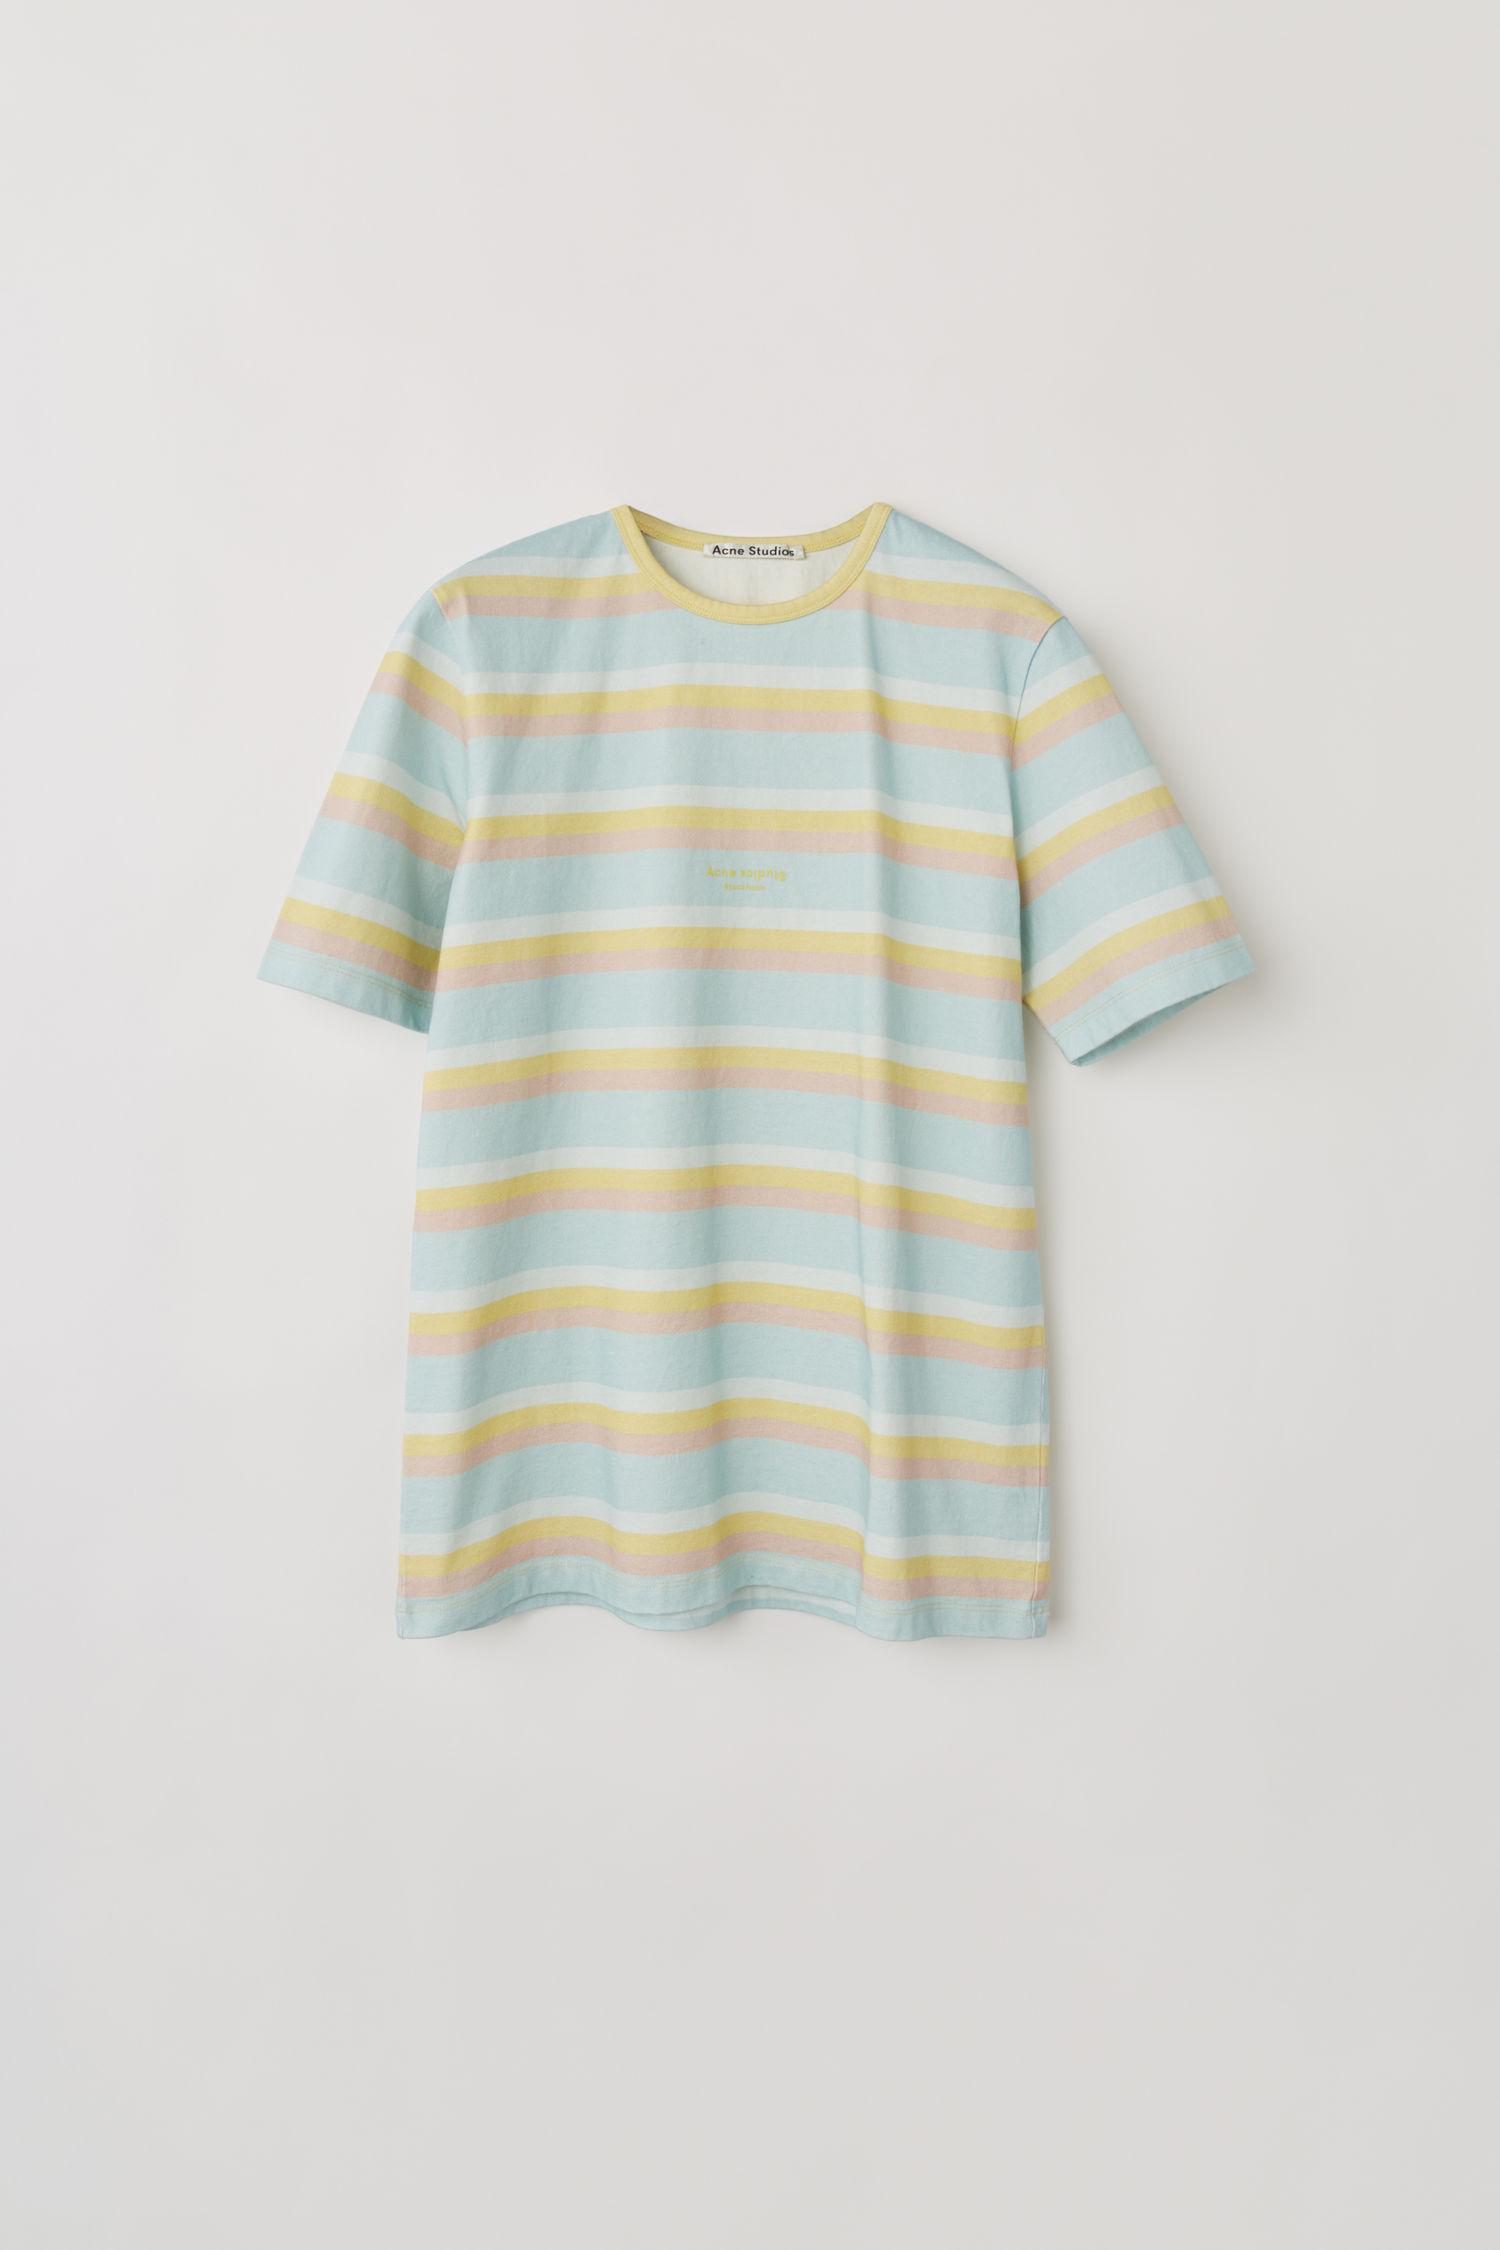 ACNE STUDIOS Pastel striped t-shirt blue/multi